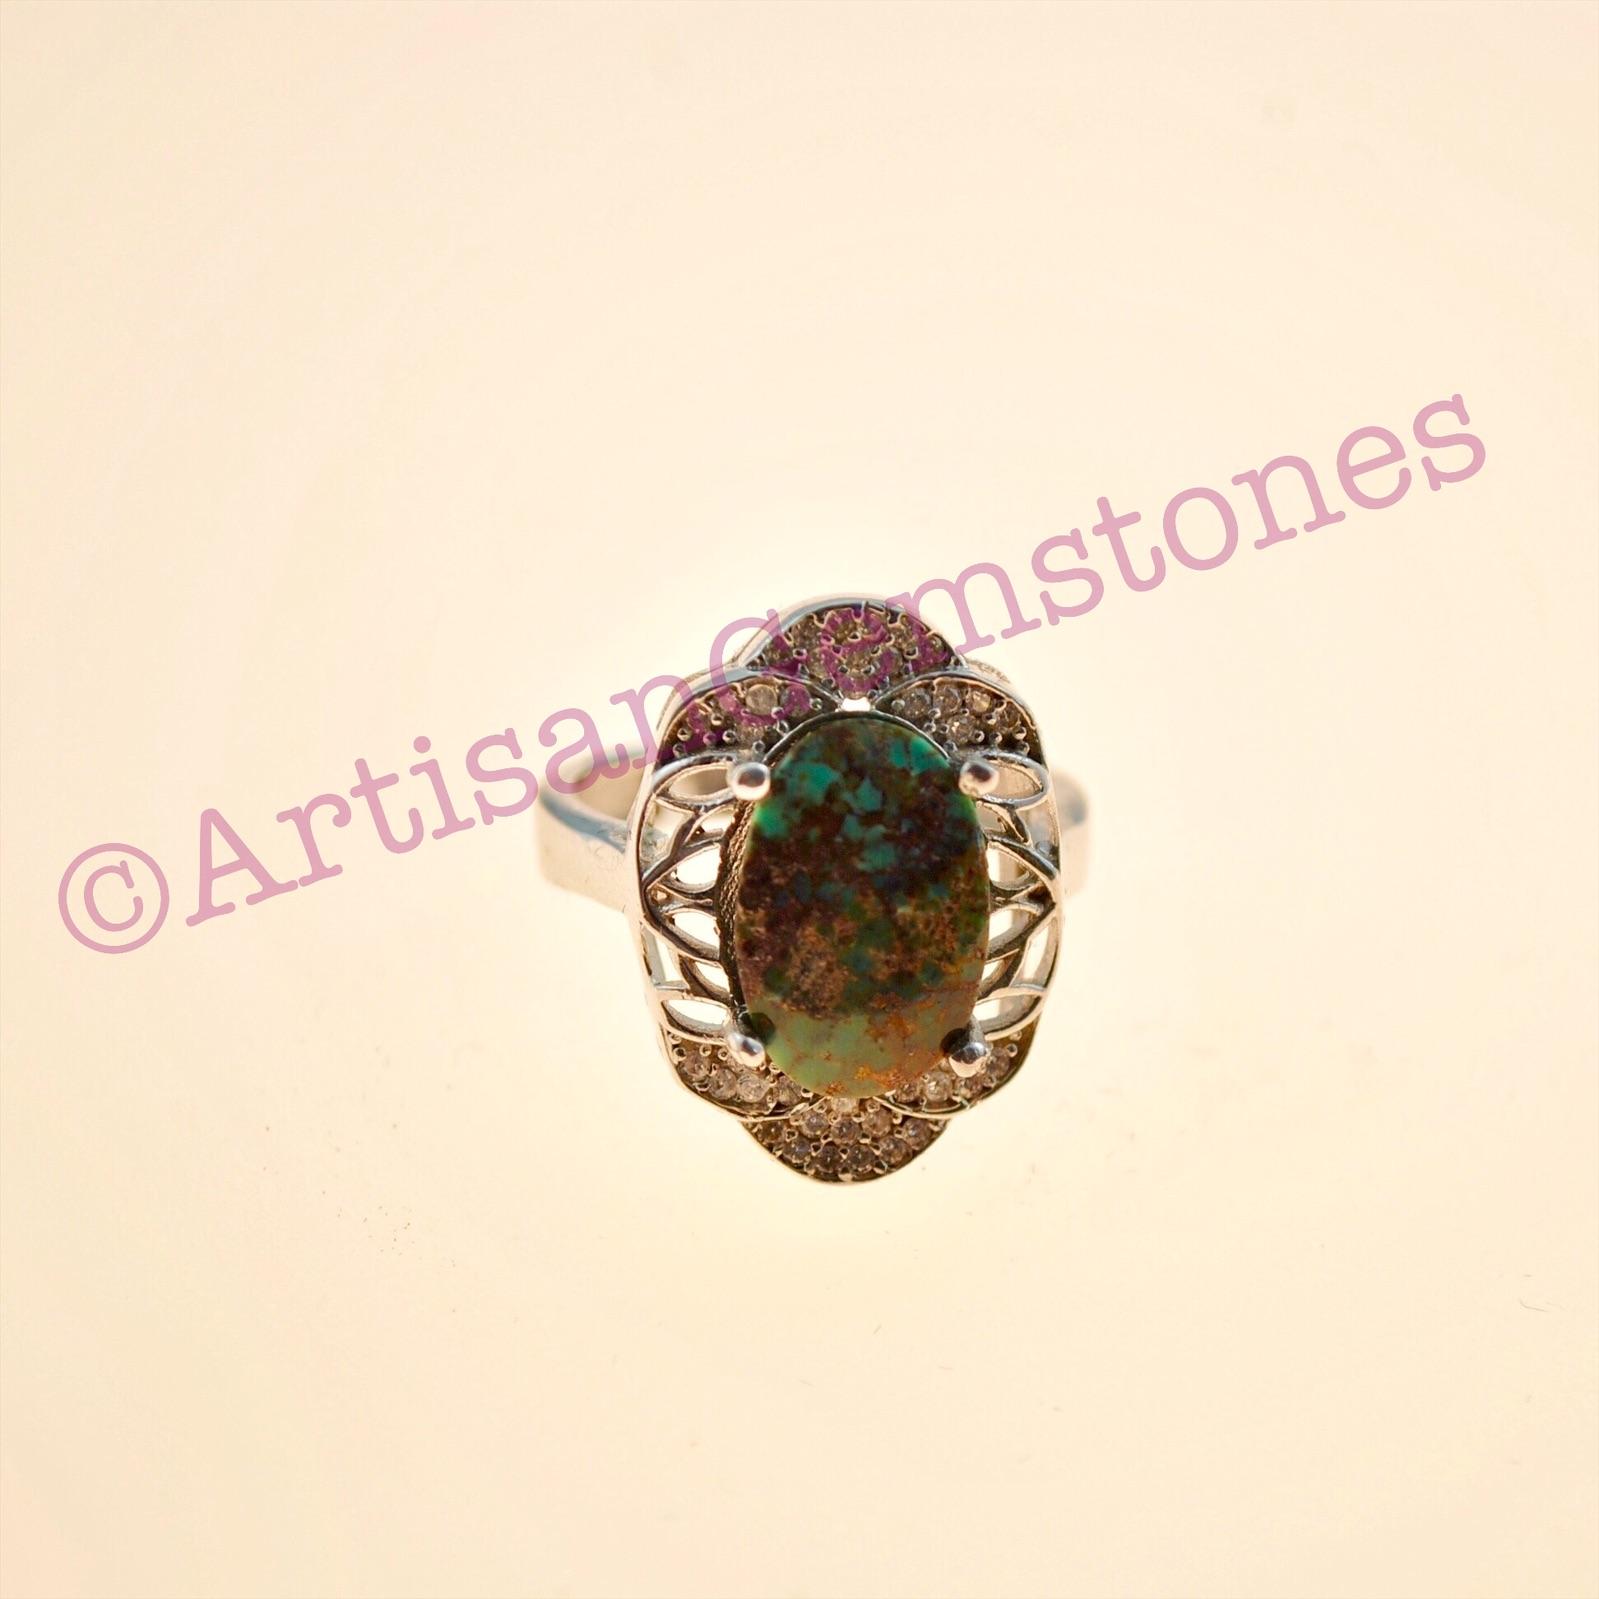 Iranian Turquoise/Feroza silver ring size 16 or P